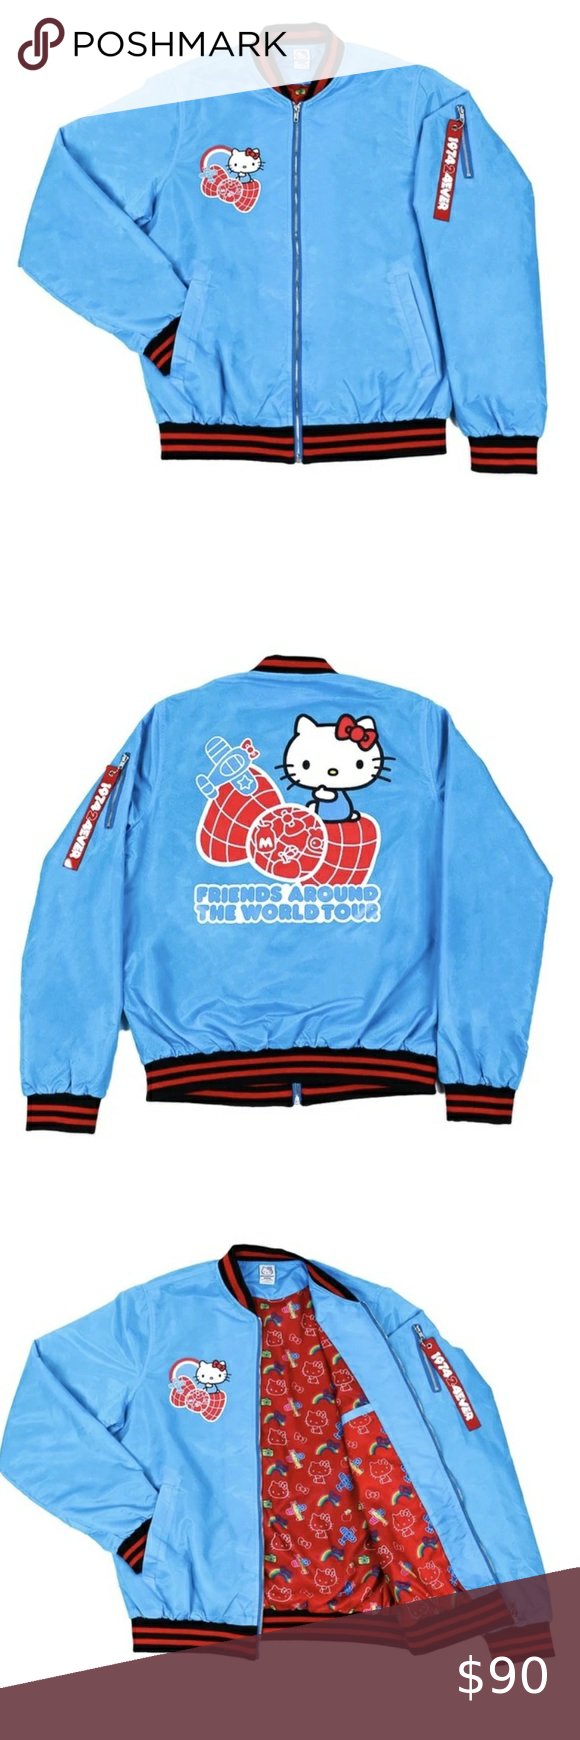 Hello Kitty Bomber Jacket Sanrio Jacket Bomber Jacket Jackets [ 1740 x 580 Pixel ]